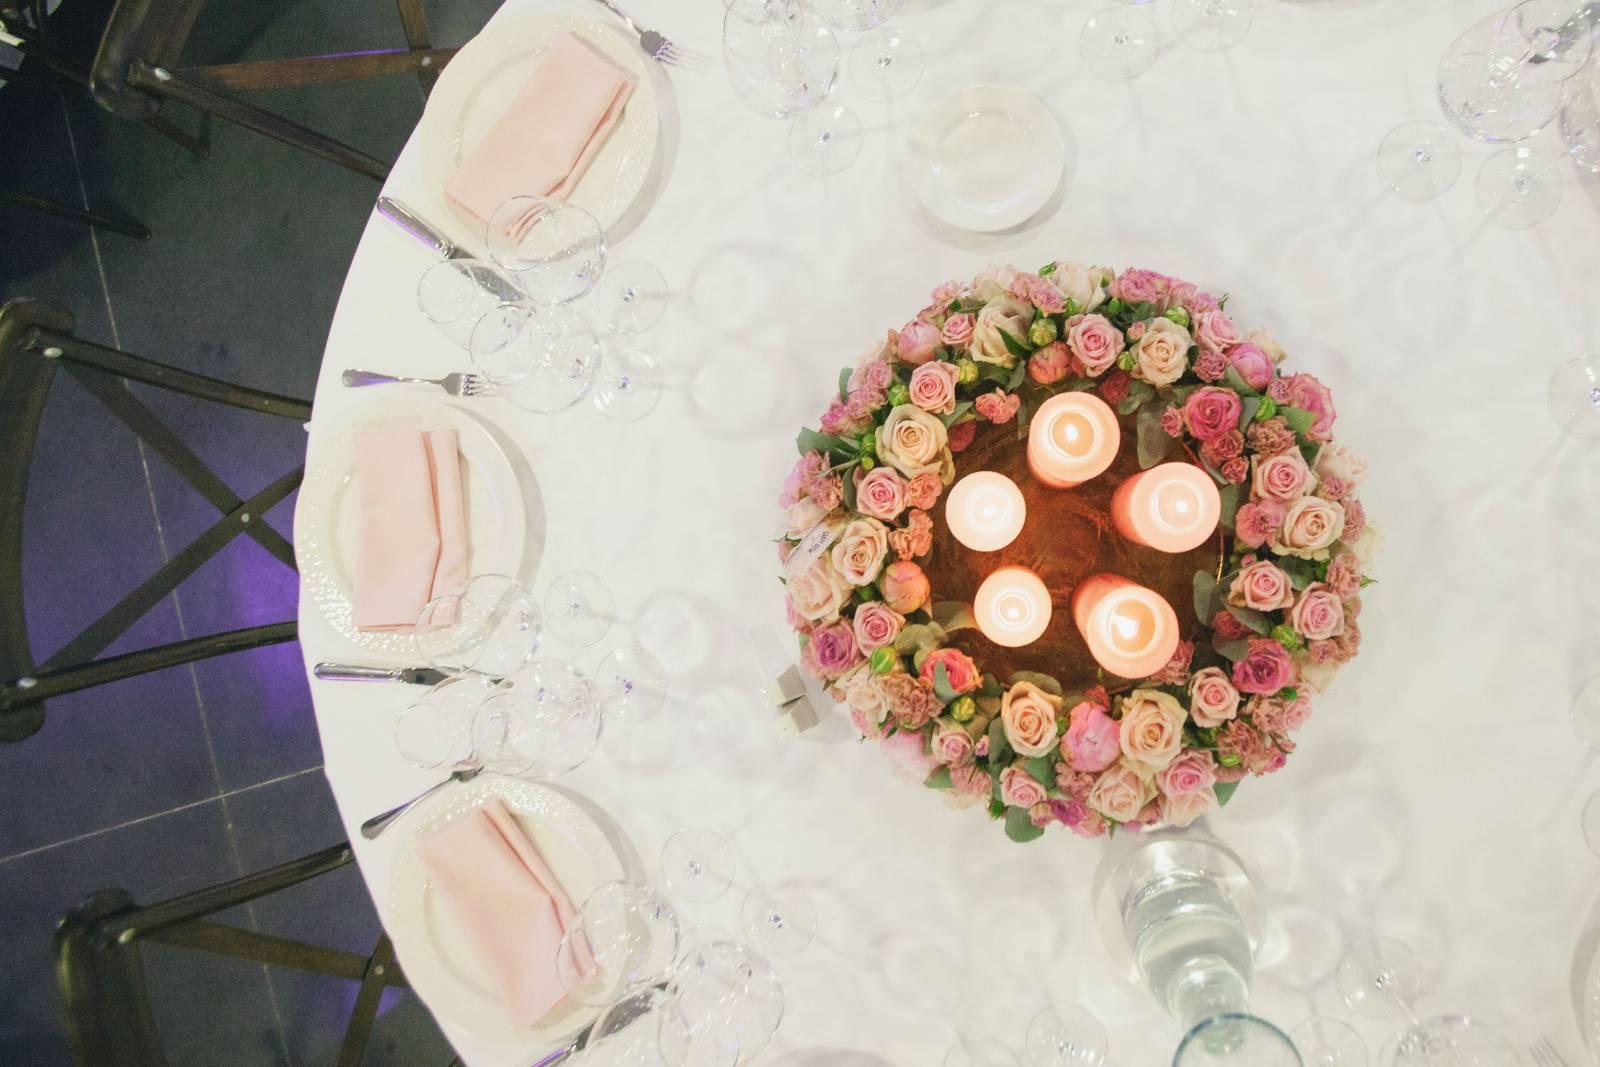 Carpe Diem Bloemen & Decoratie - House of Weddings  - 35